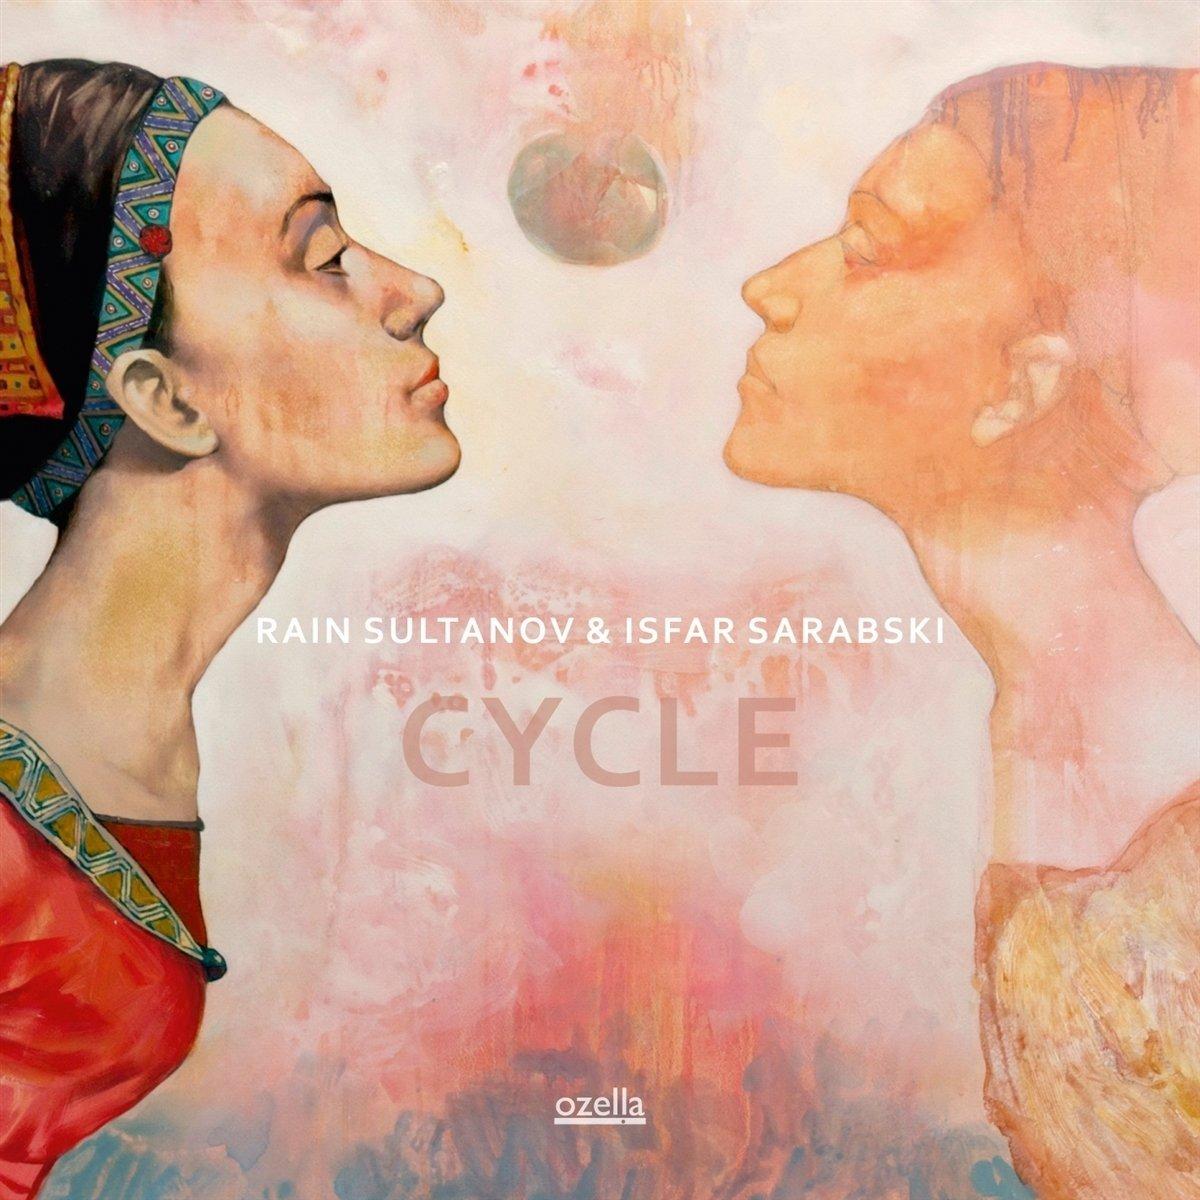 RAIN SULTANOV - Rain Sultanov & Isfar Sarabski : Cycle cover